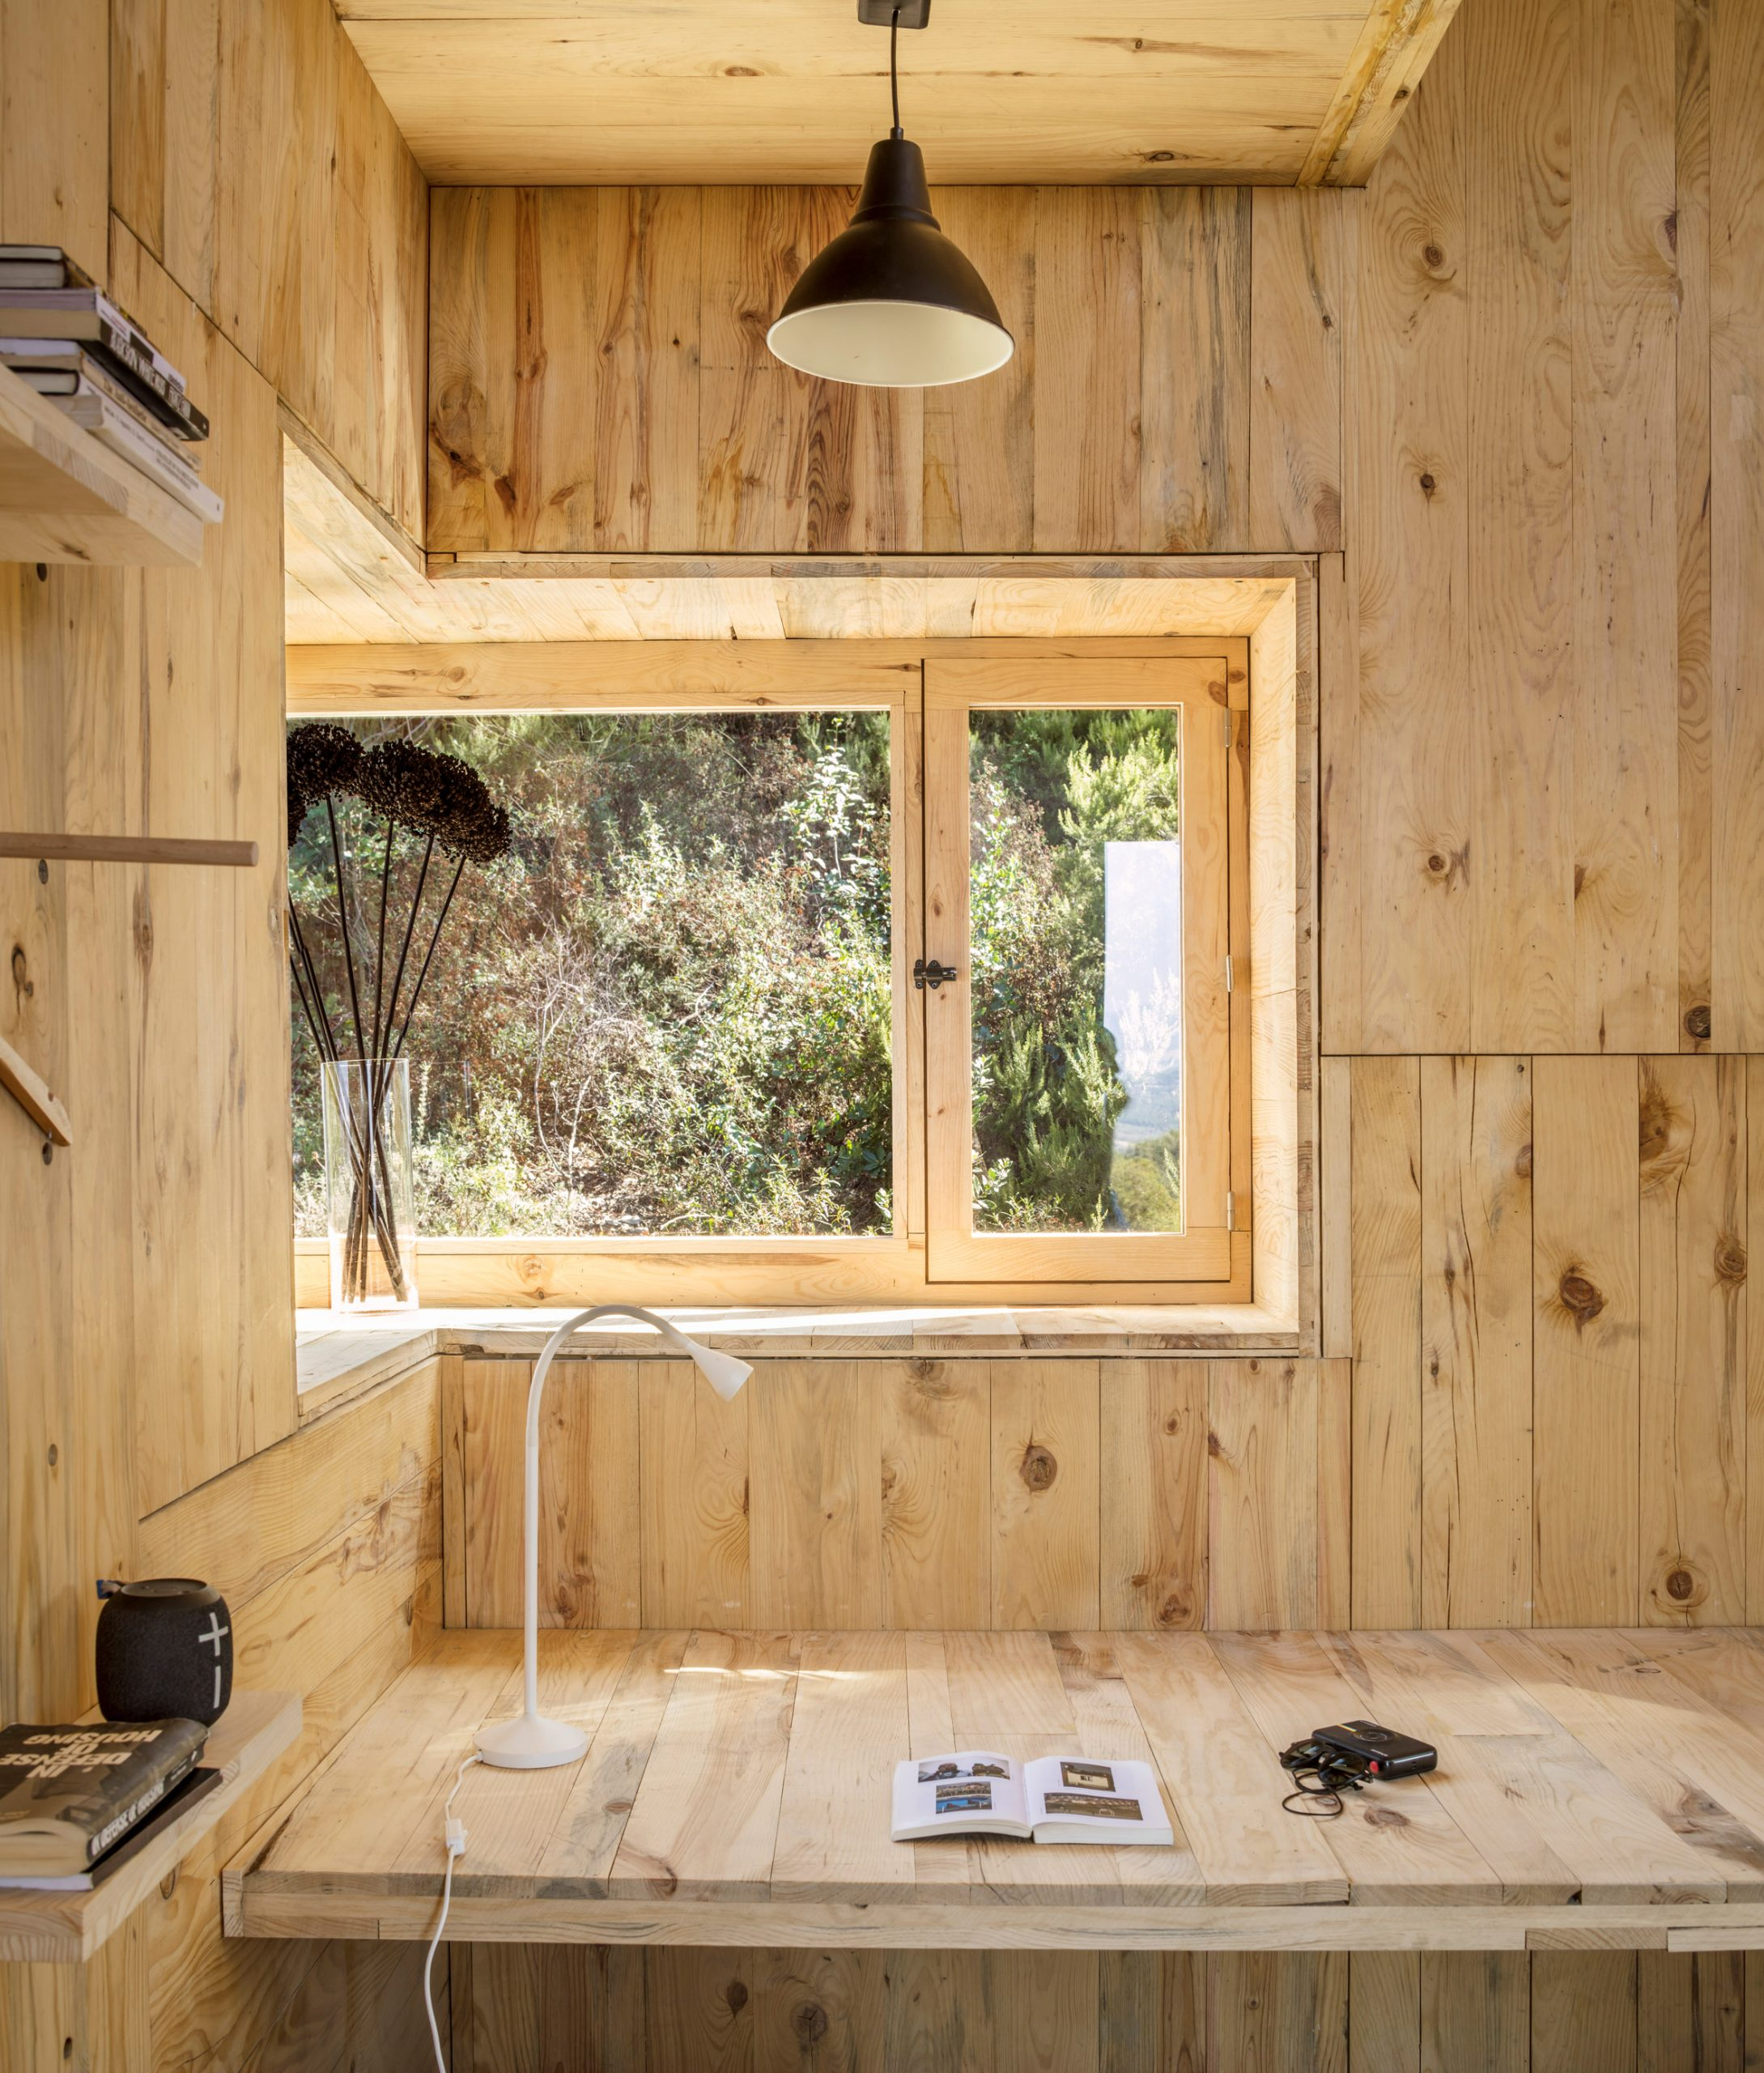 A desk inside The Voxel cabin